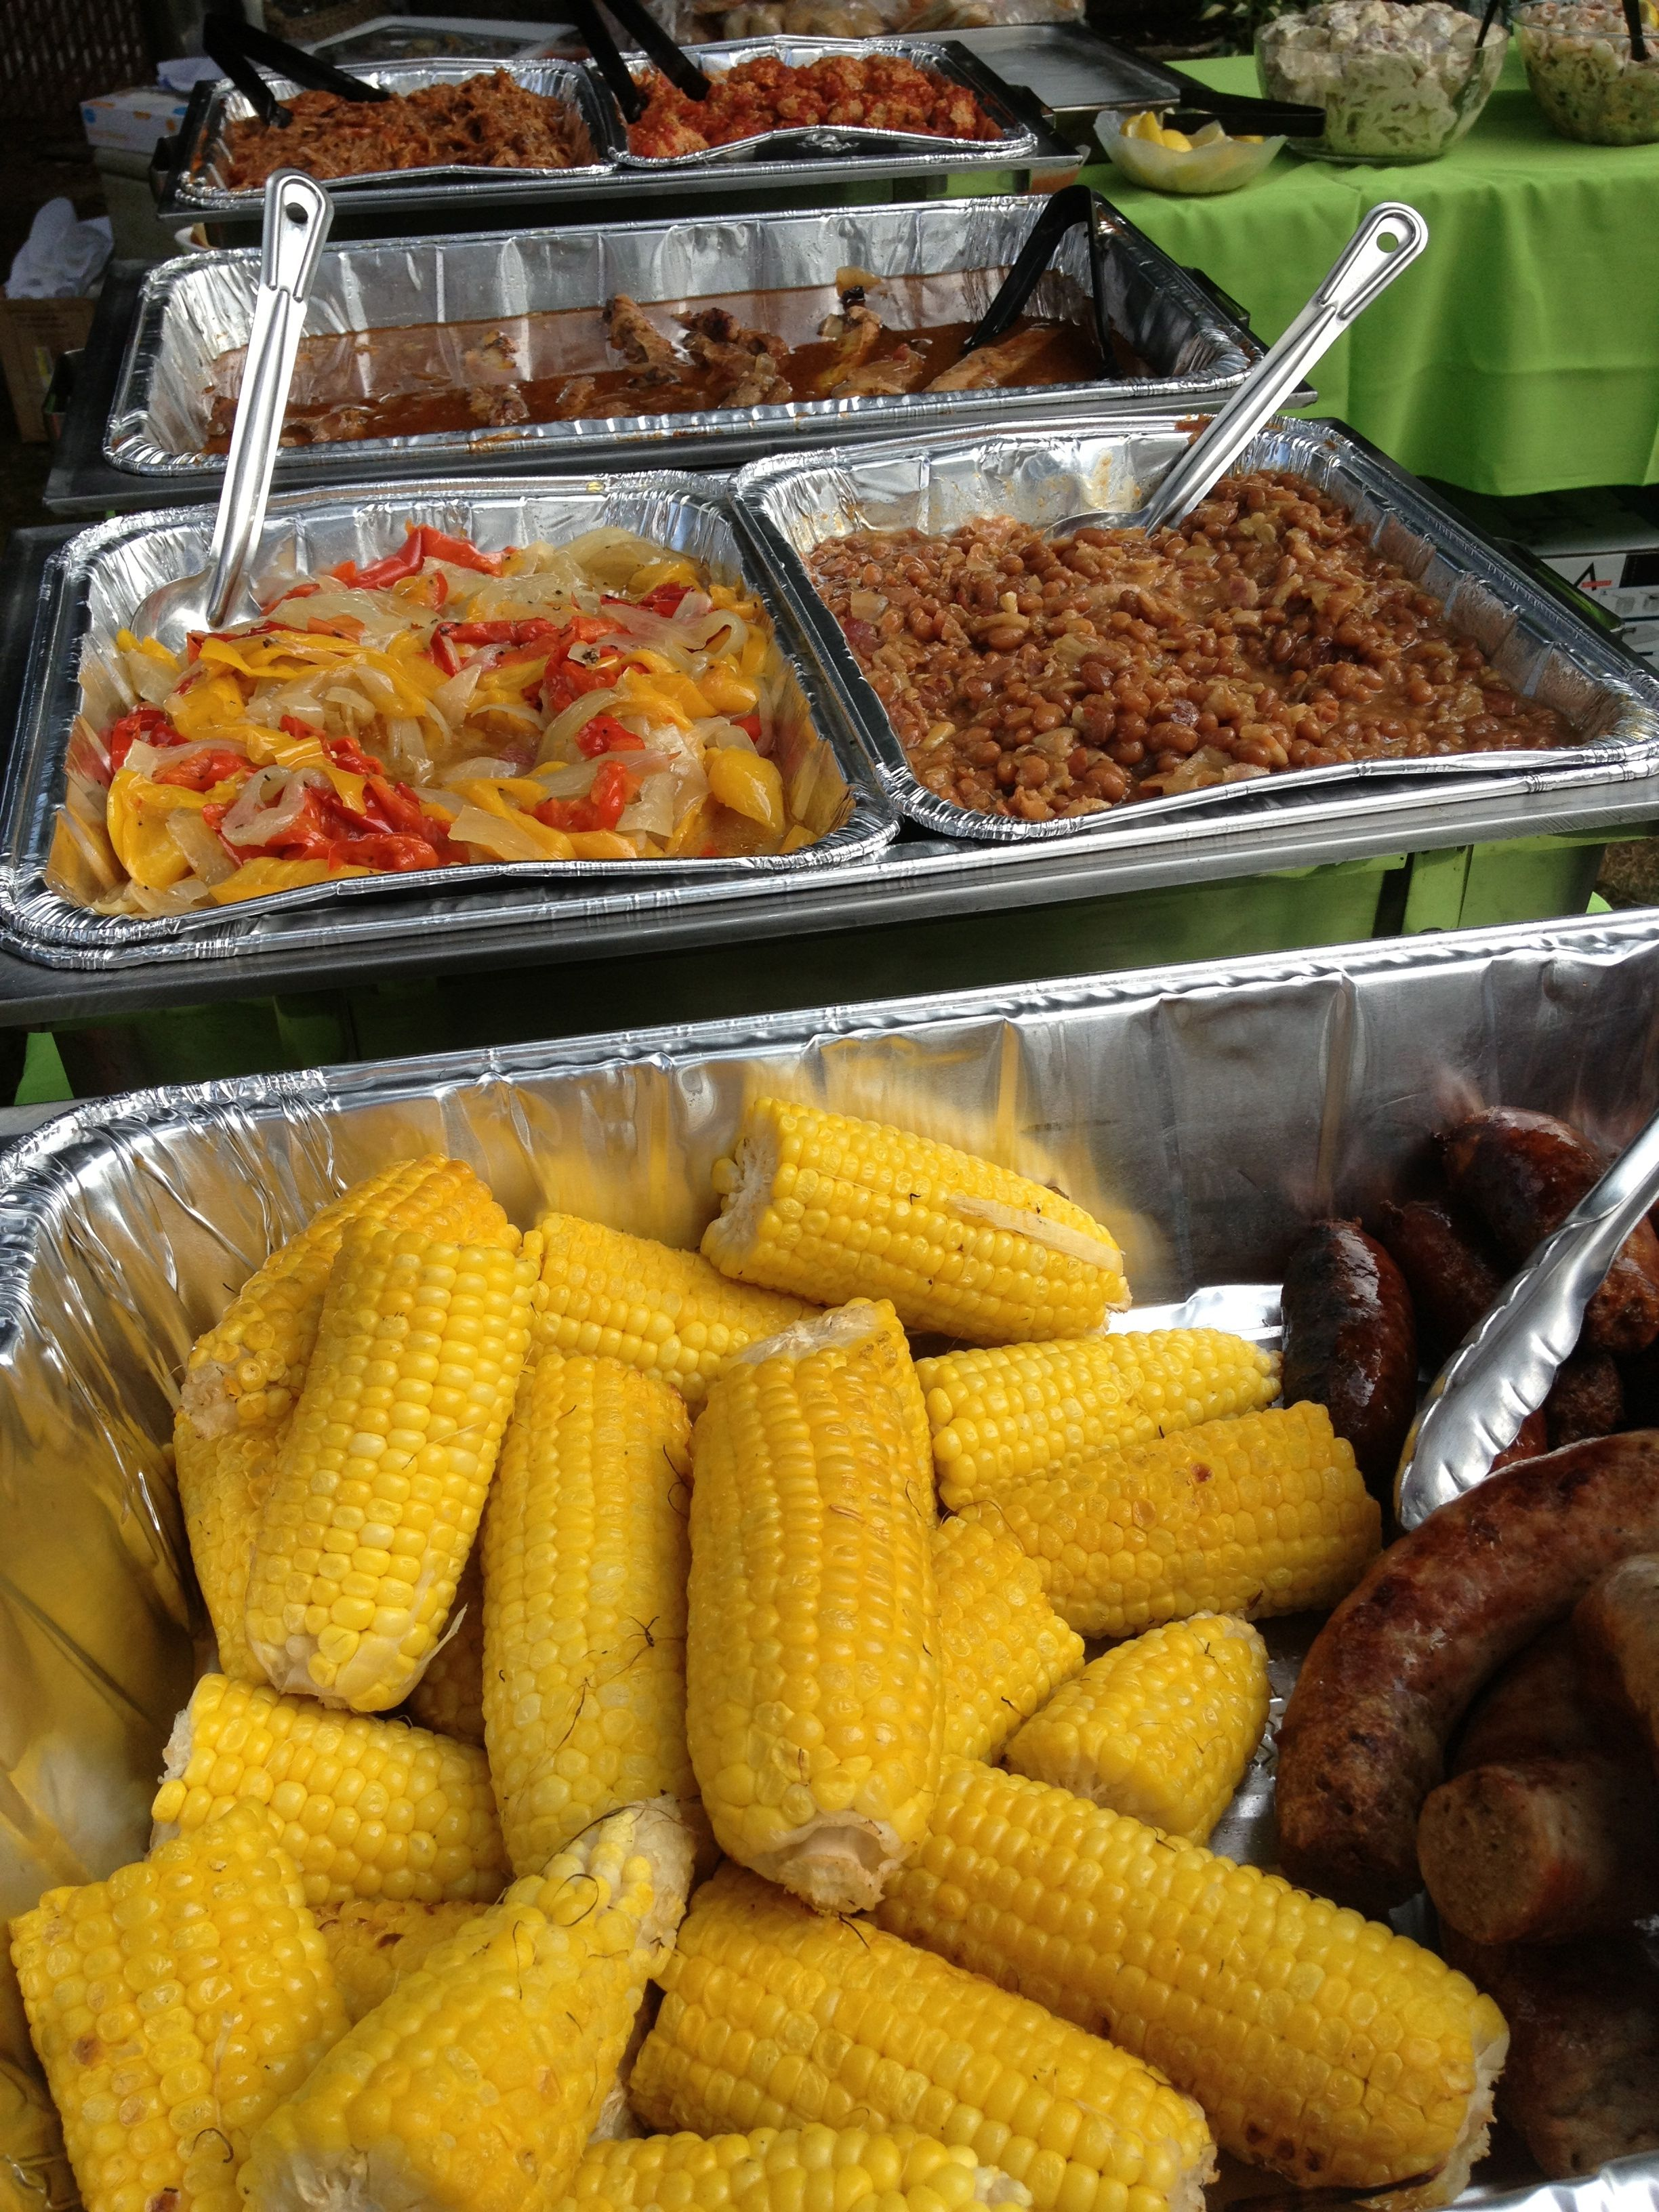 Backyard BBQ | Catering Items | Pinterest | Backyard bbq ...